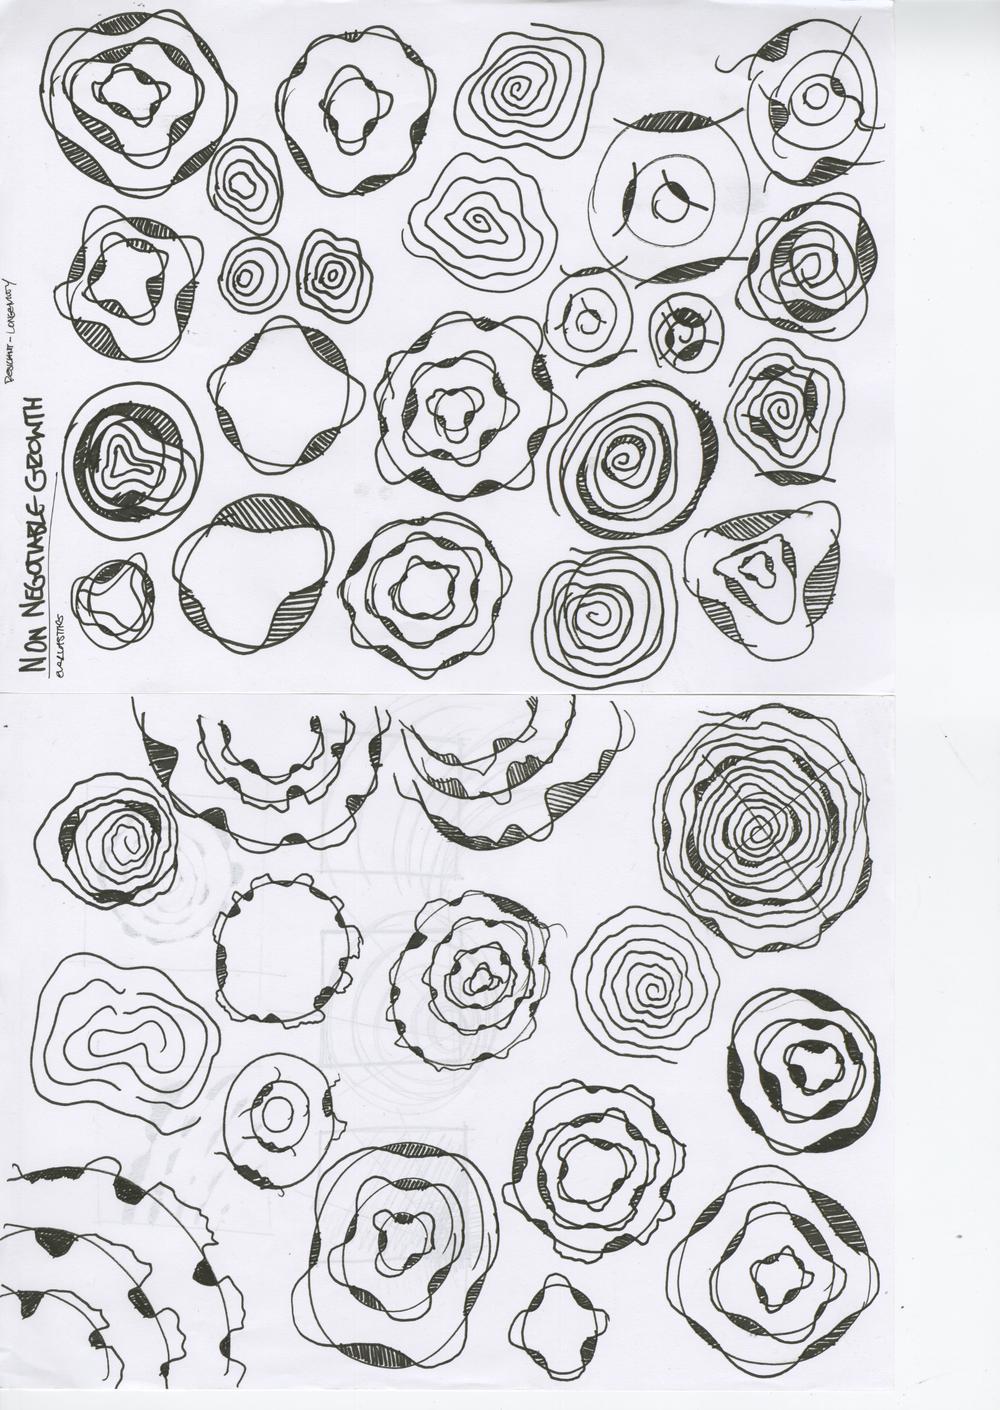 3_expressives&illustrations 14.png